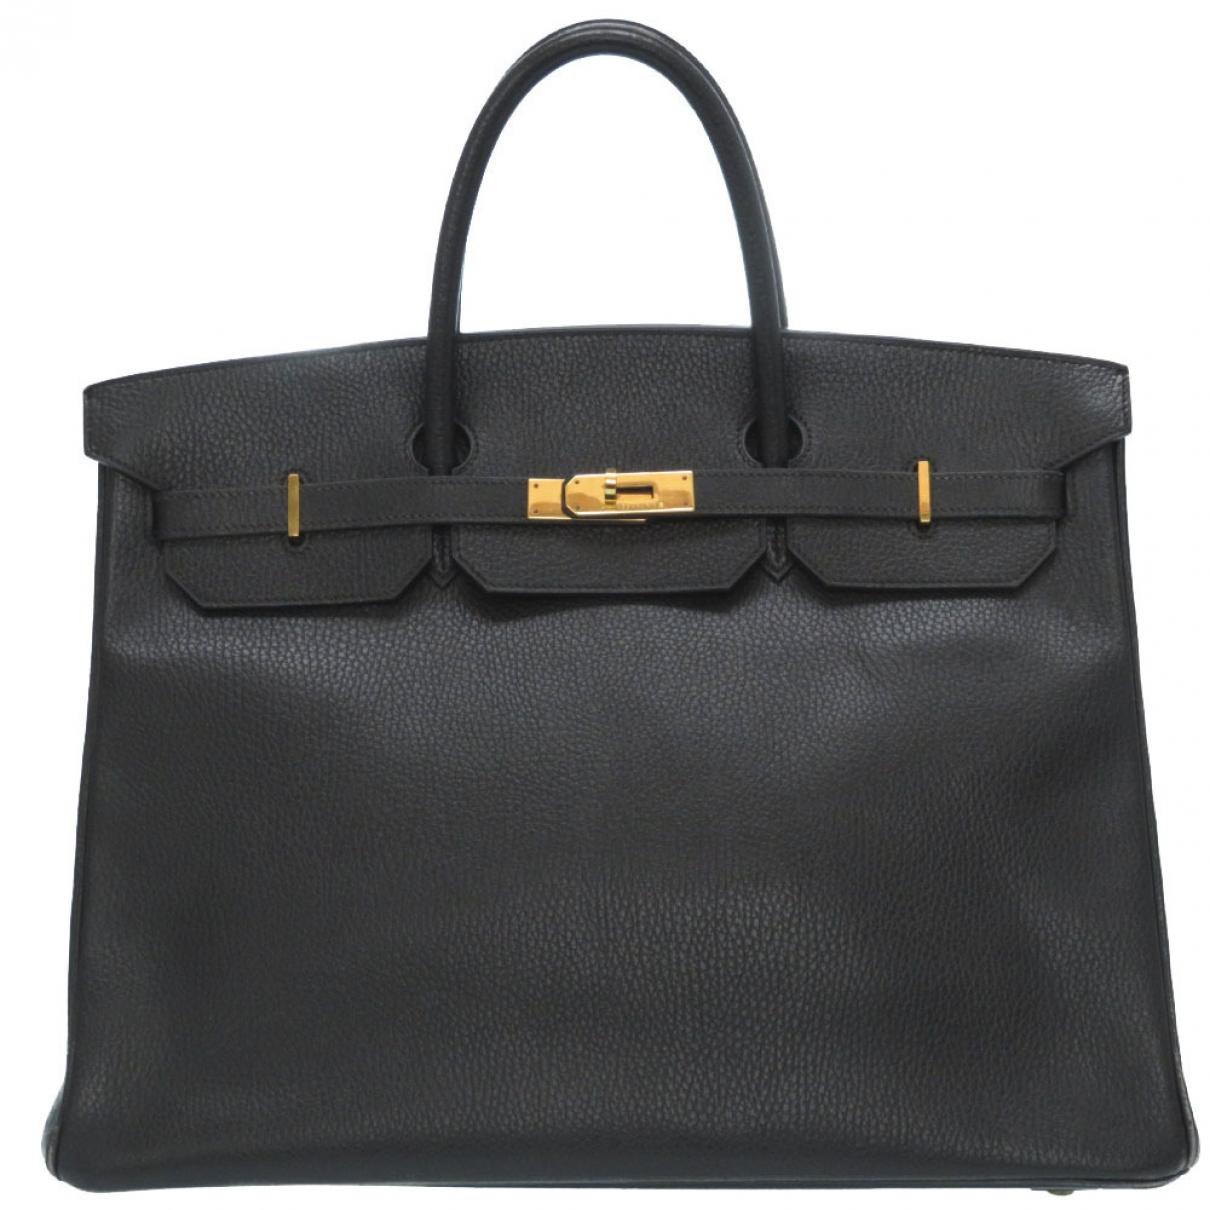 Hermes - Sac a main Birkin 30 pour femme en cuir - noir